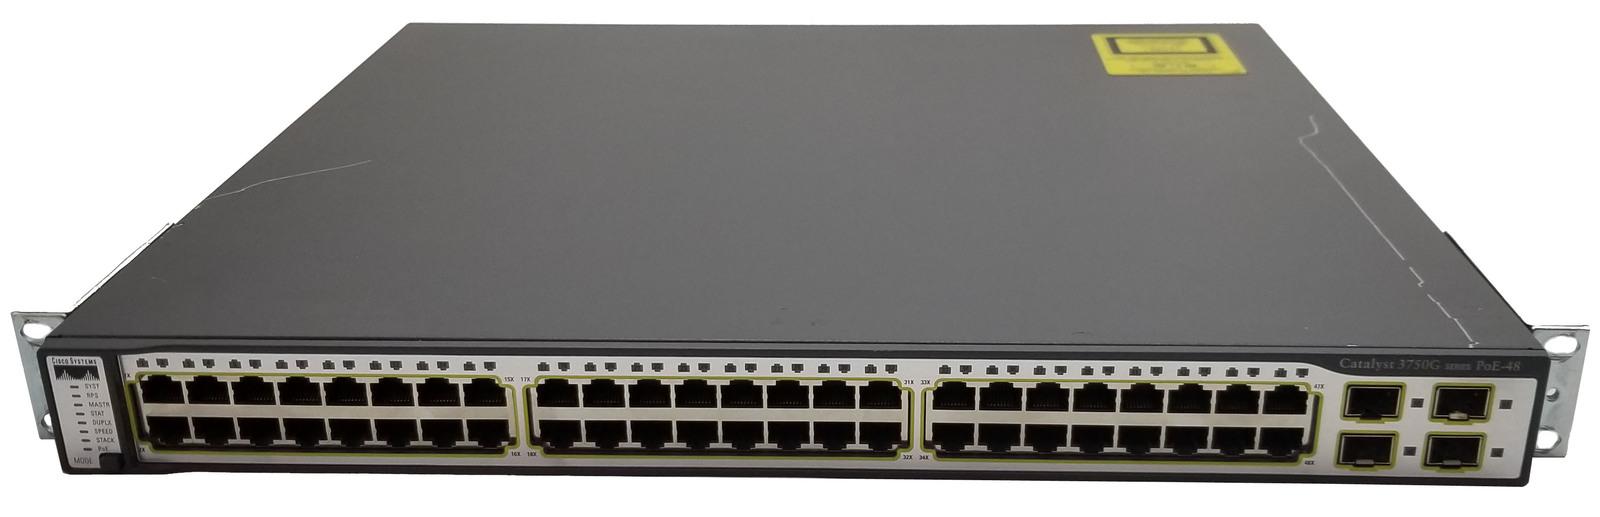 Cisco 3750G 48 Port POE Gigabit Switch C3750G-48PS-S Bin:9